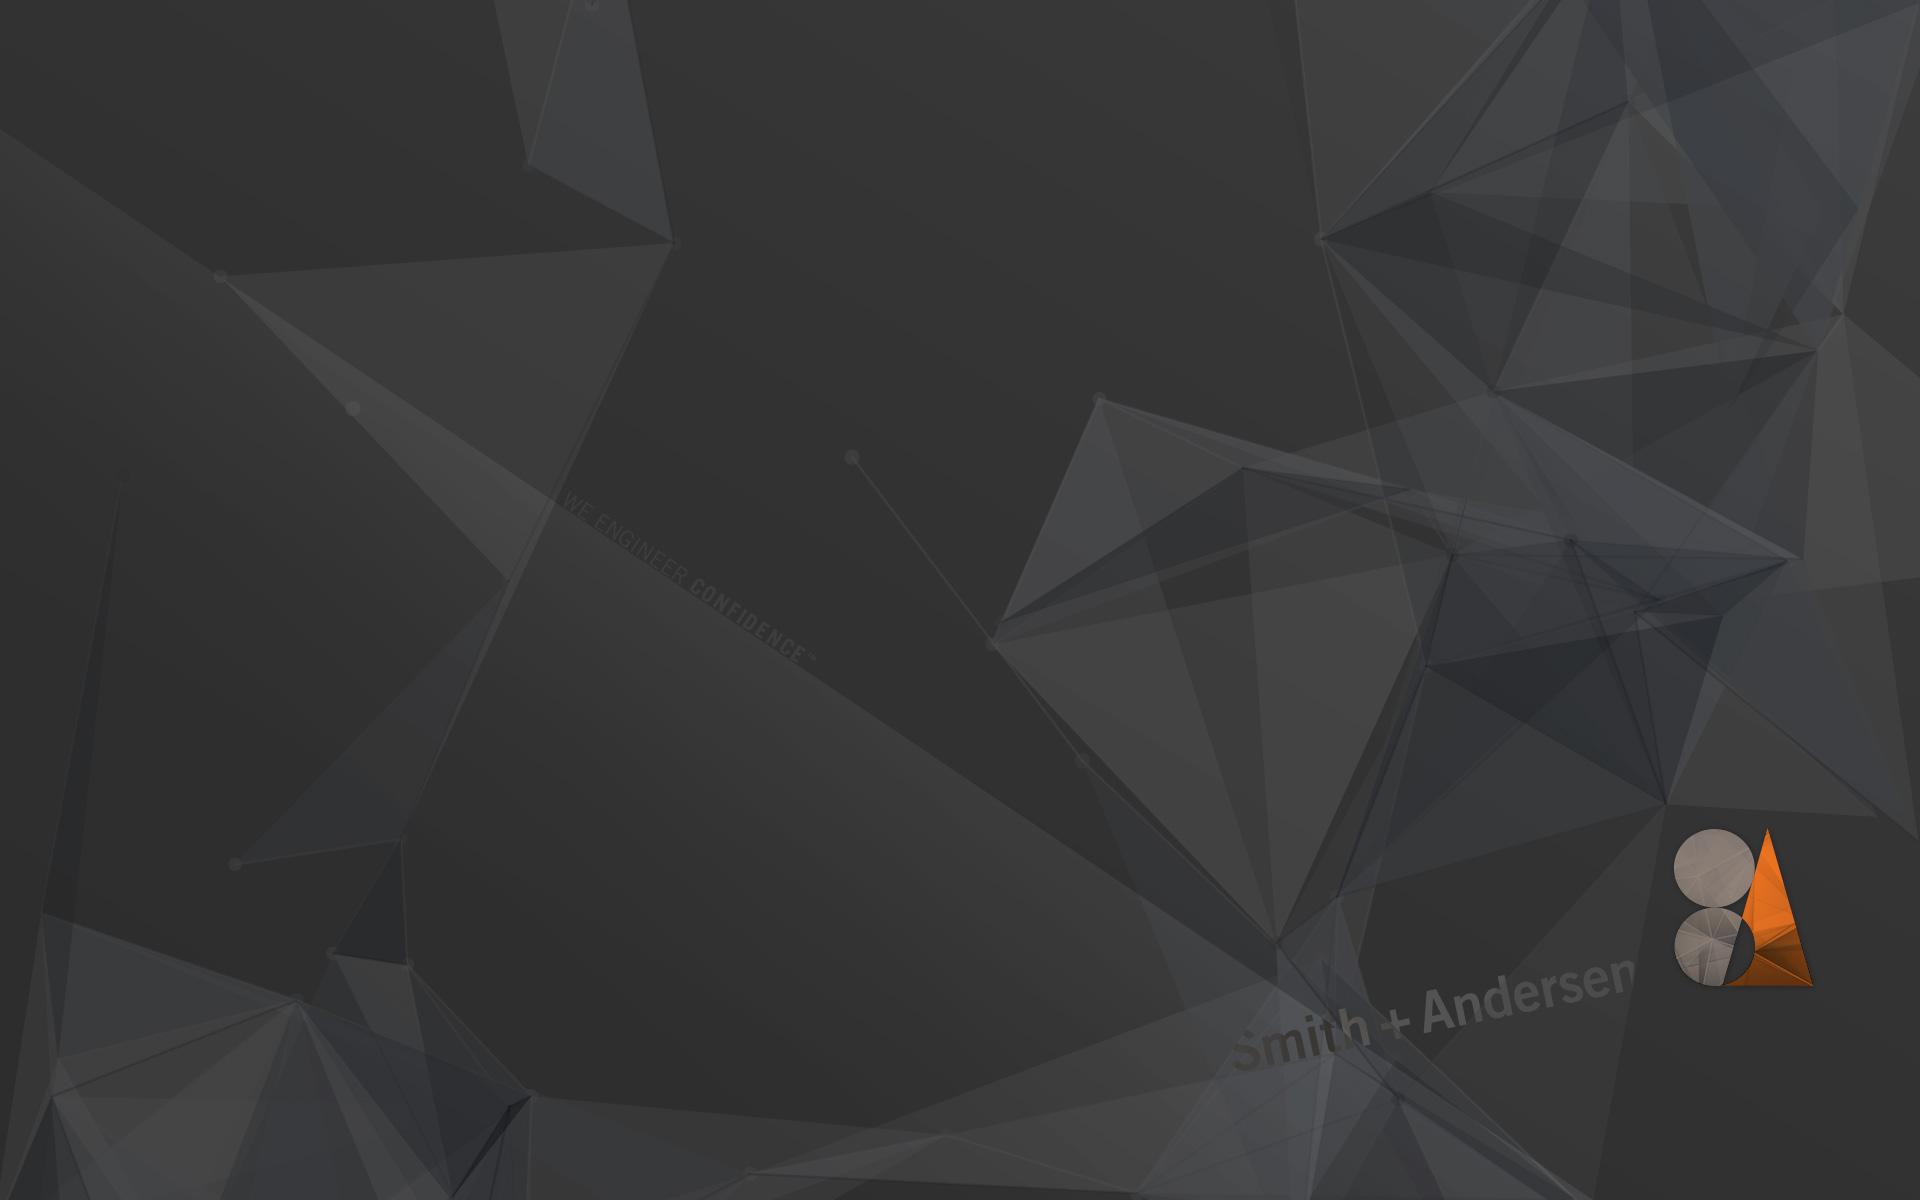 desktop-wallpaper-1920x1200